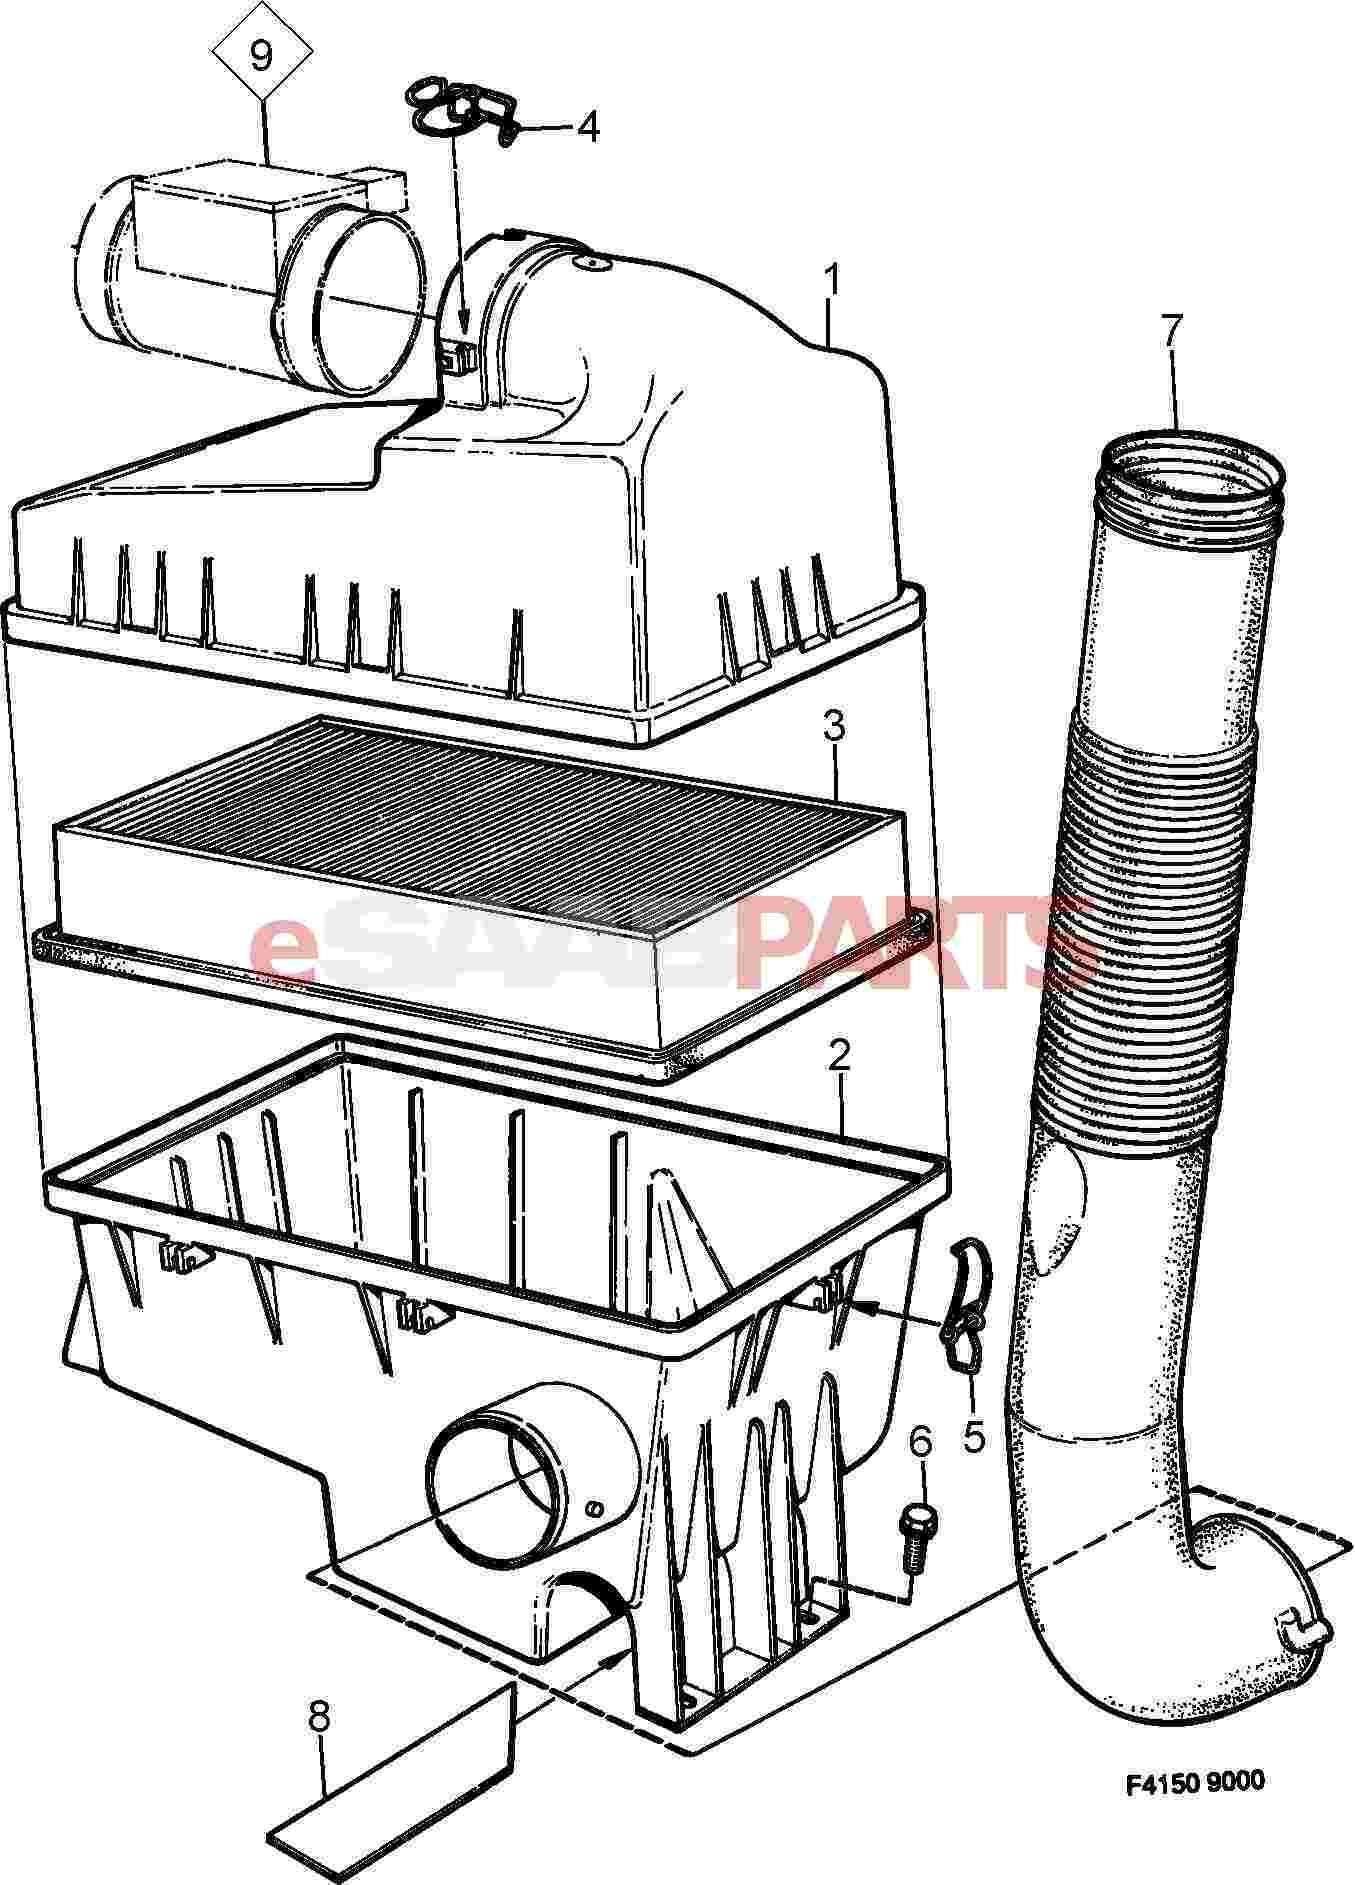 Ej255 Engine Diagram. Diagram. Auto Wiring Diagram